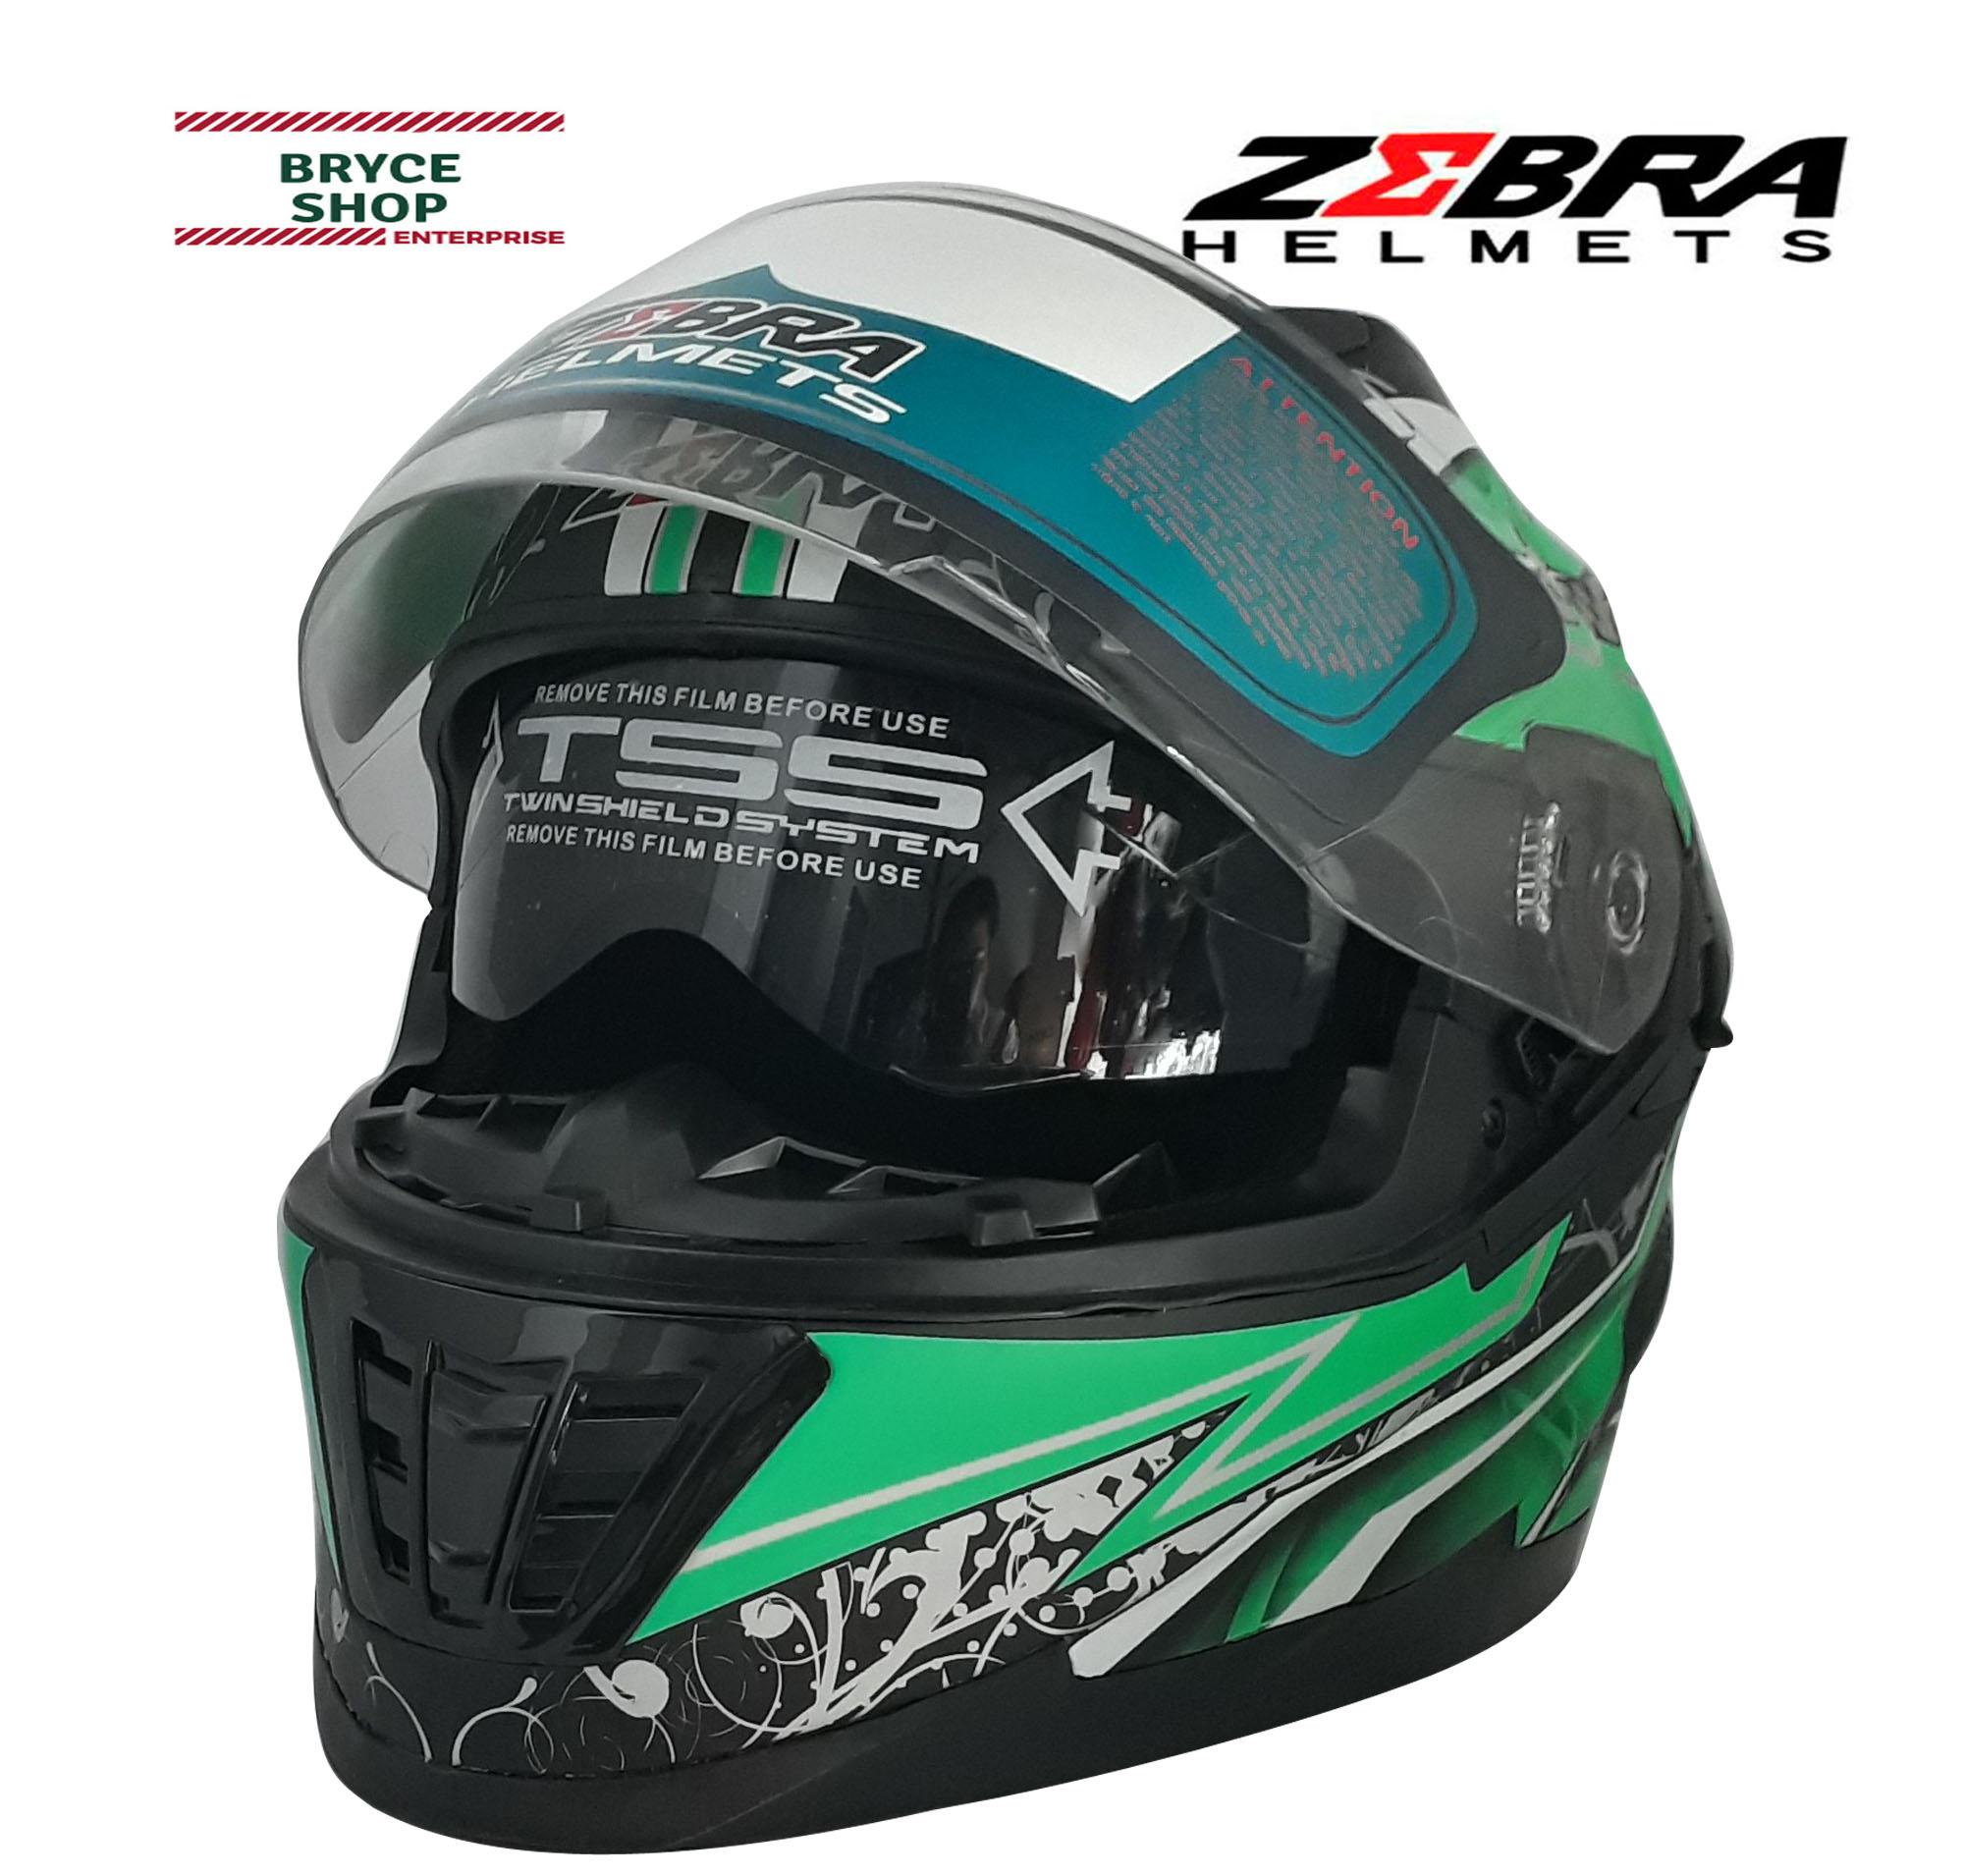 506f0a51 Product details of Zebra Dual Visor Full Face Helmet (Various Designs -  Matte)